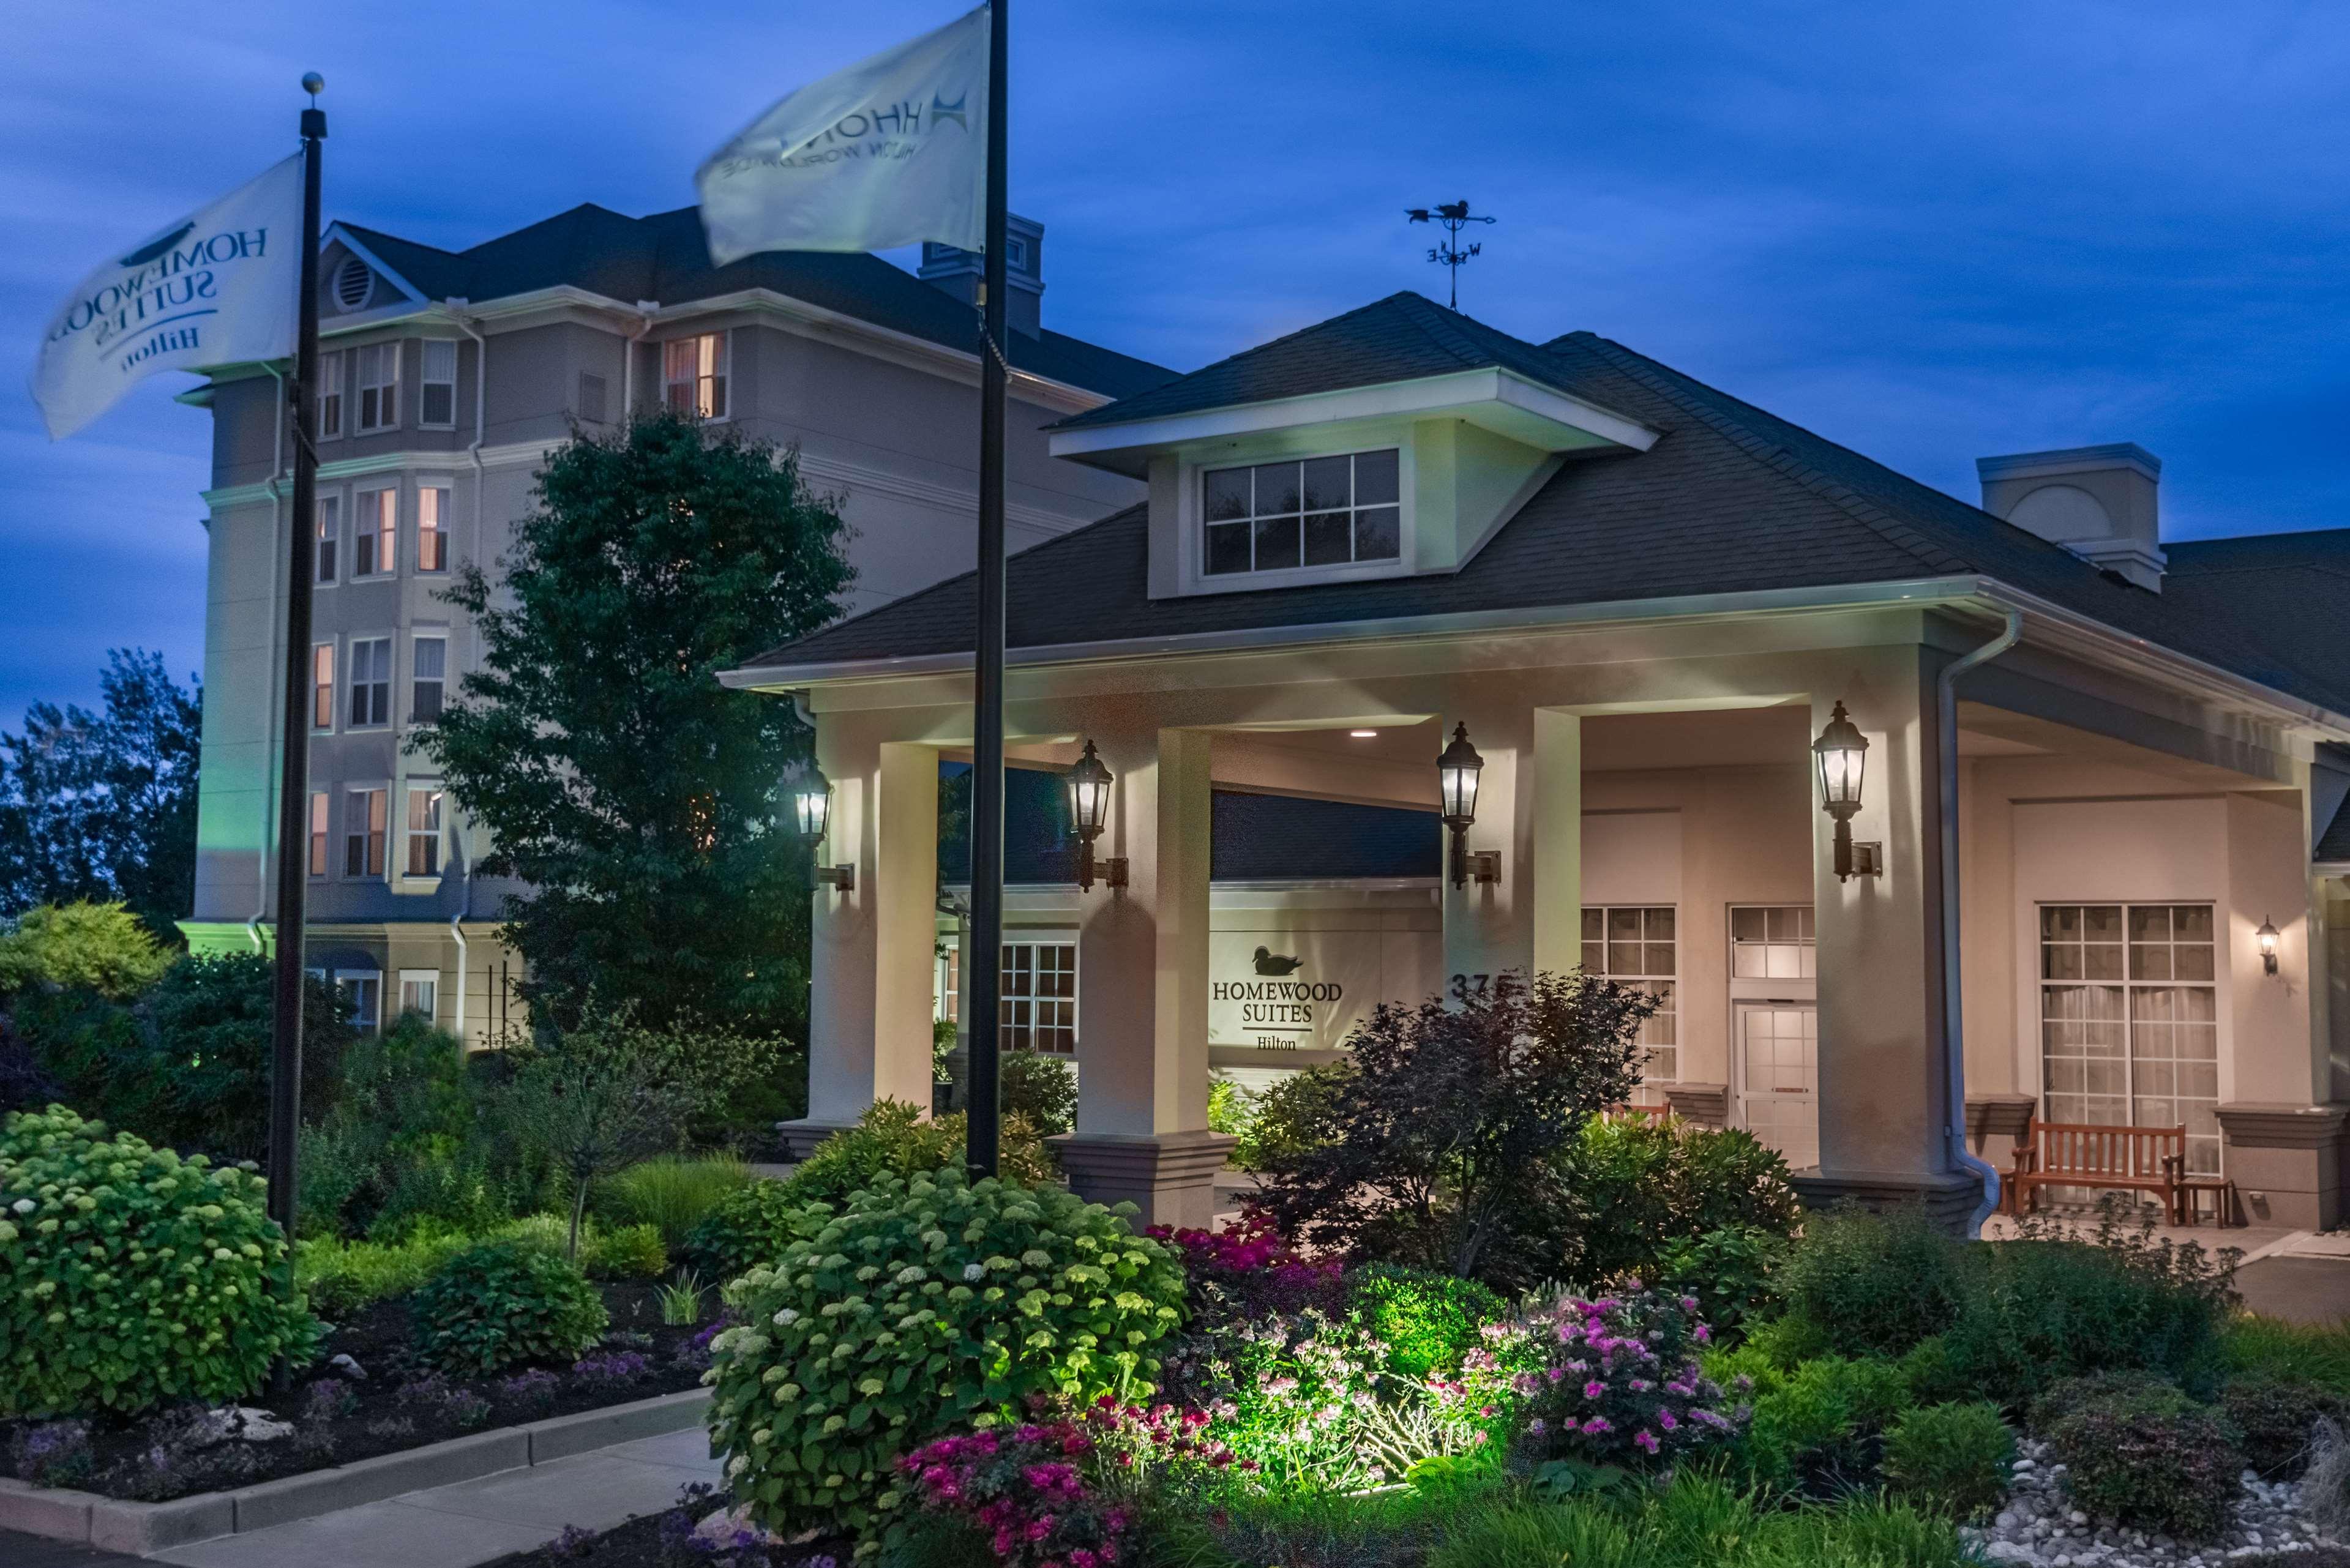 Homewood Suites by Hilton Holyoke-Springfield/North image 1